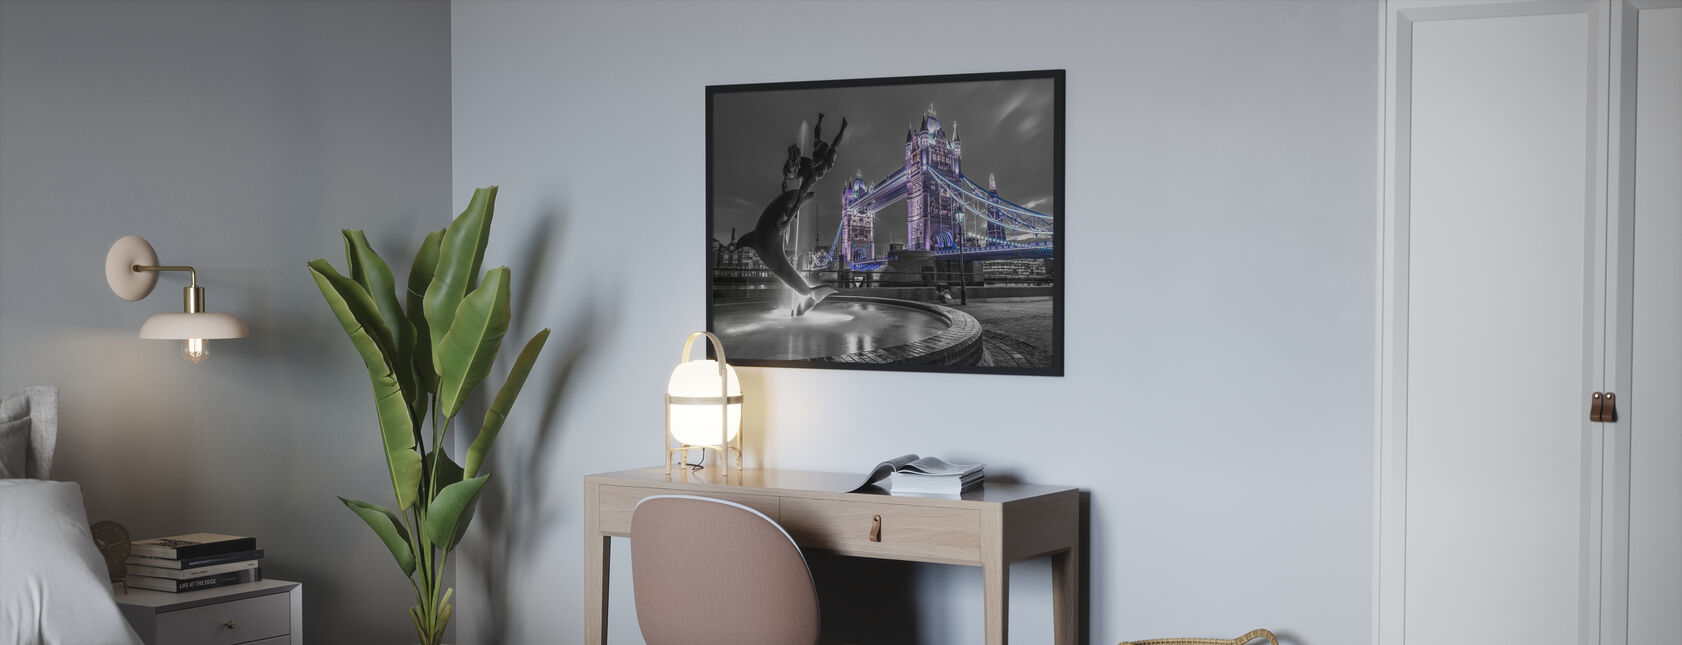 Tower Bridger på natten - London - Plakat - Soverom